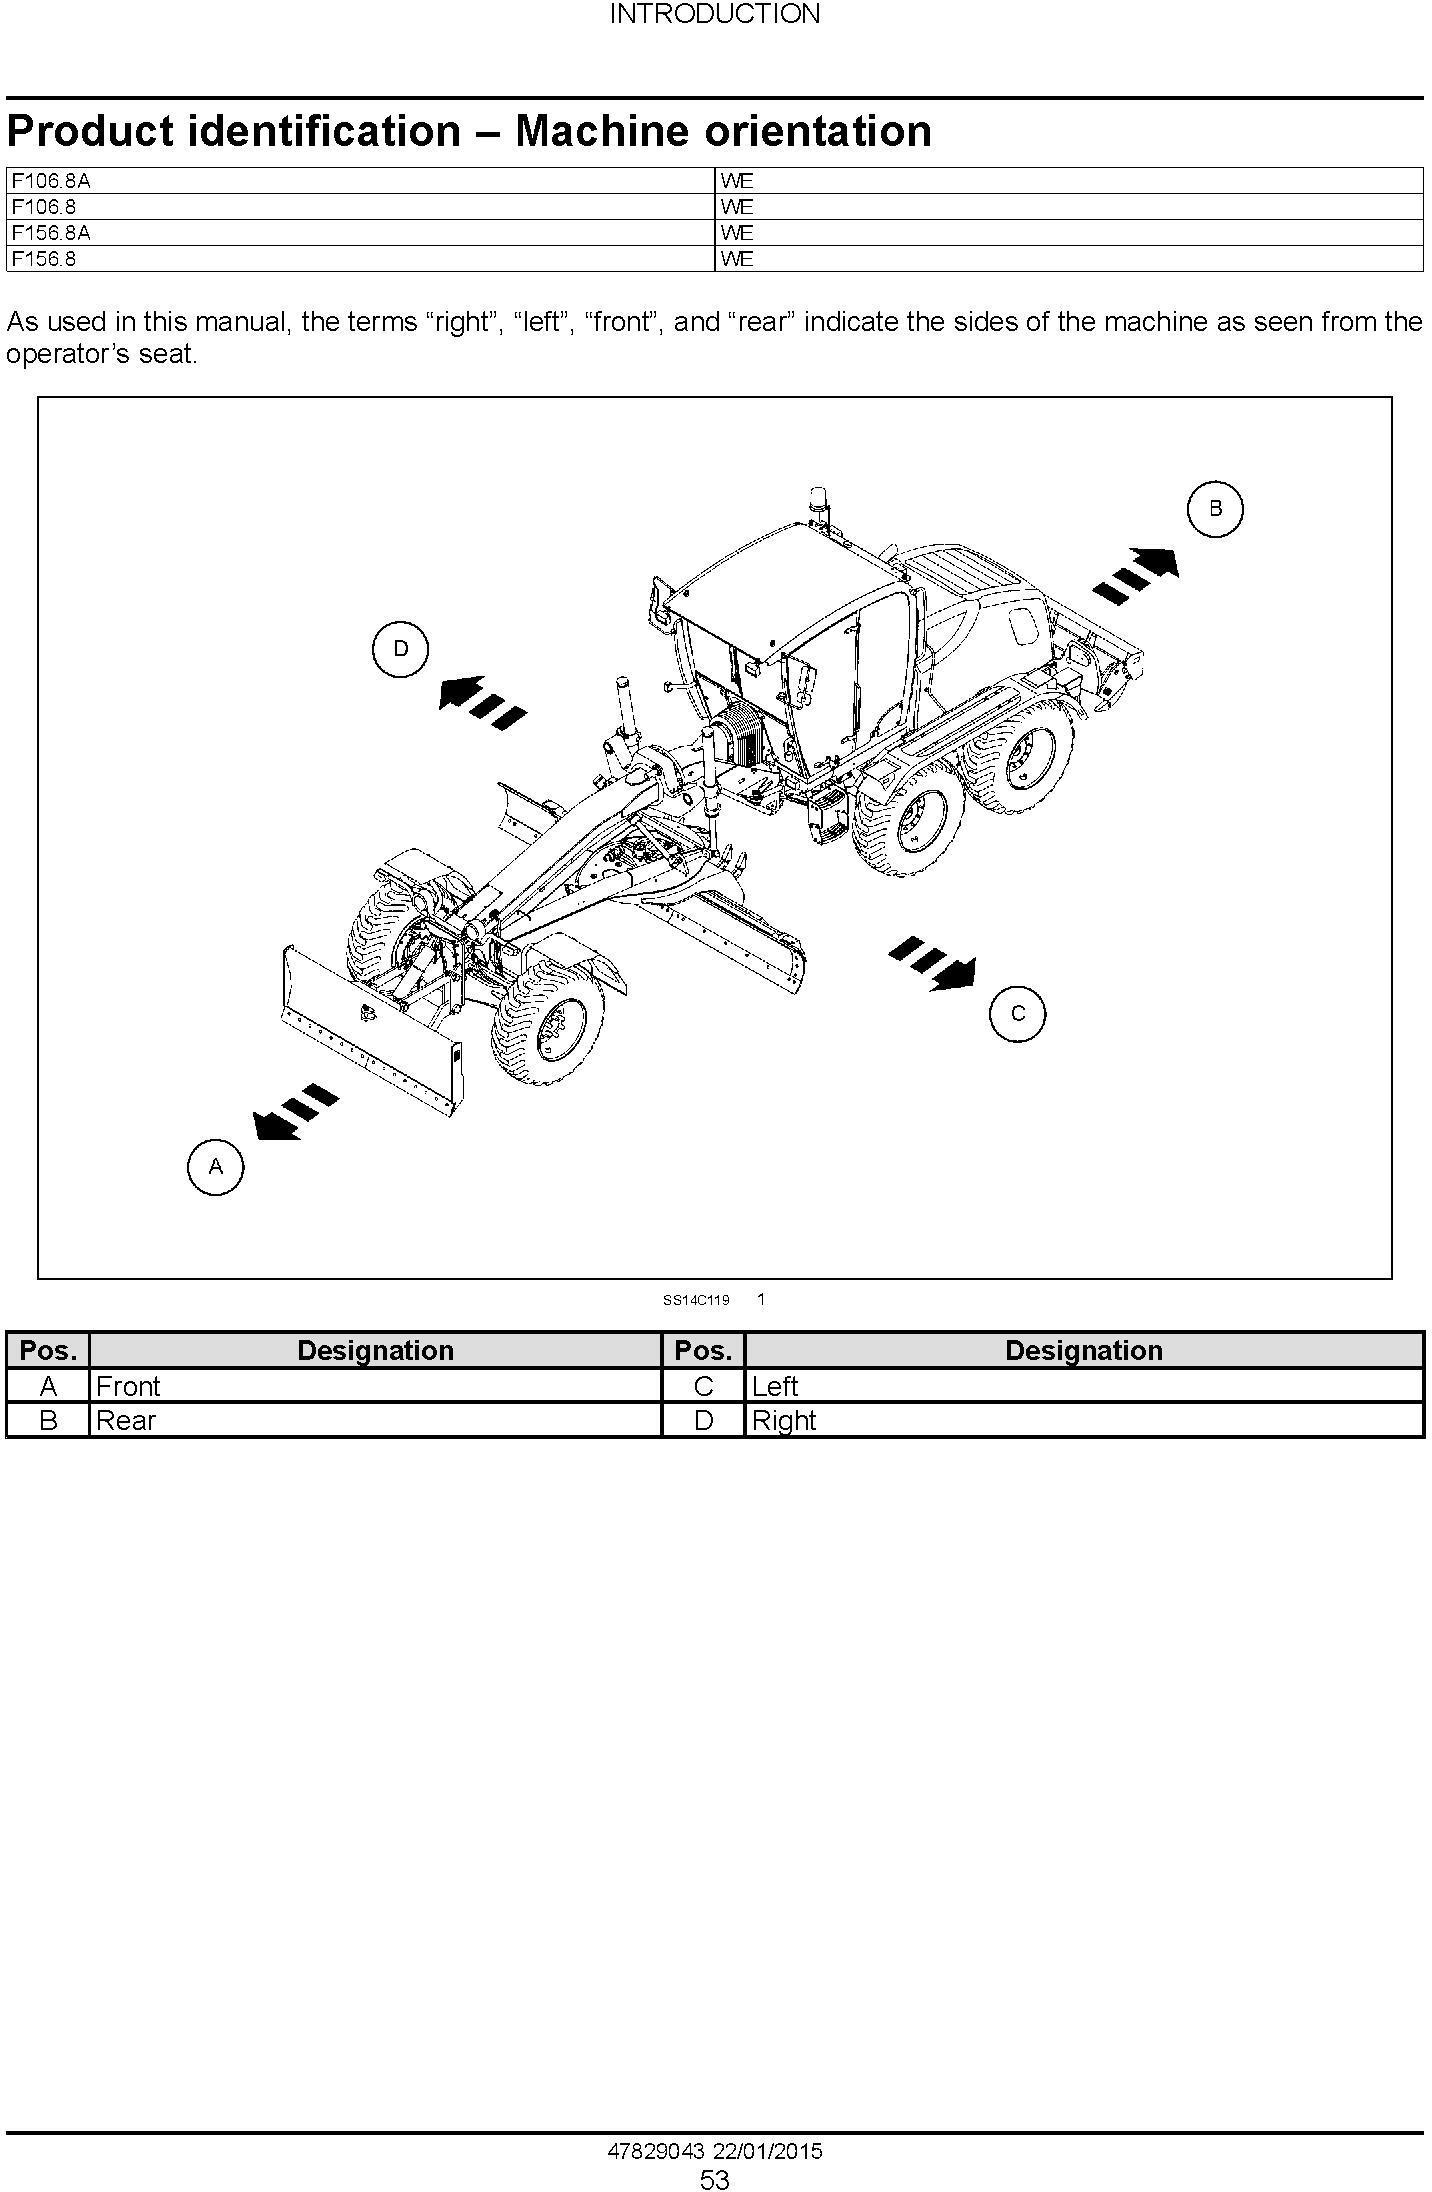 New Holland F106.8, F106.8A, F156.8, F156.8A Motor grader Service Manual - 2